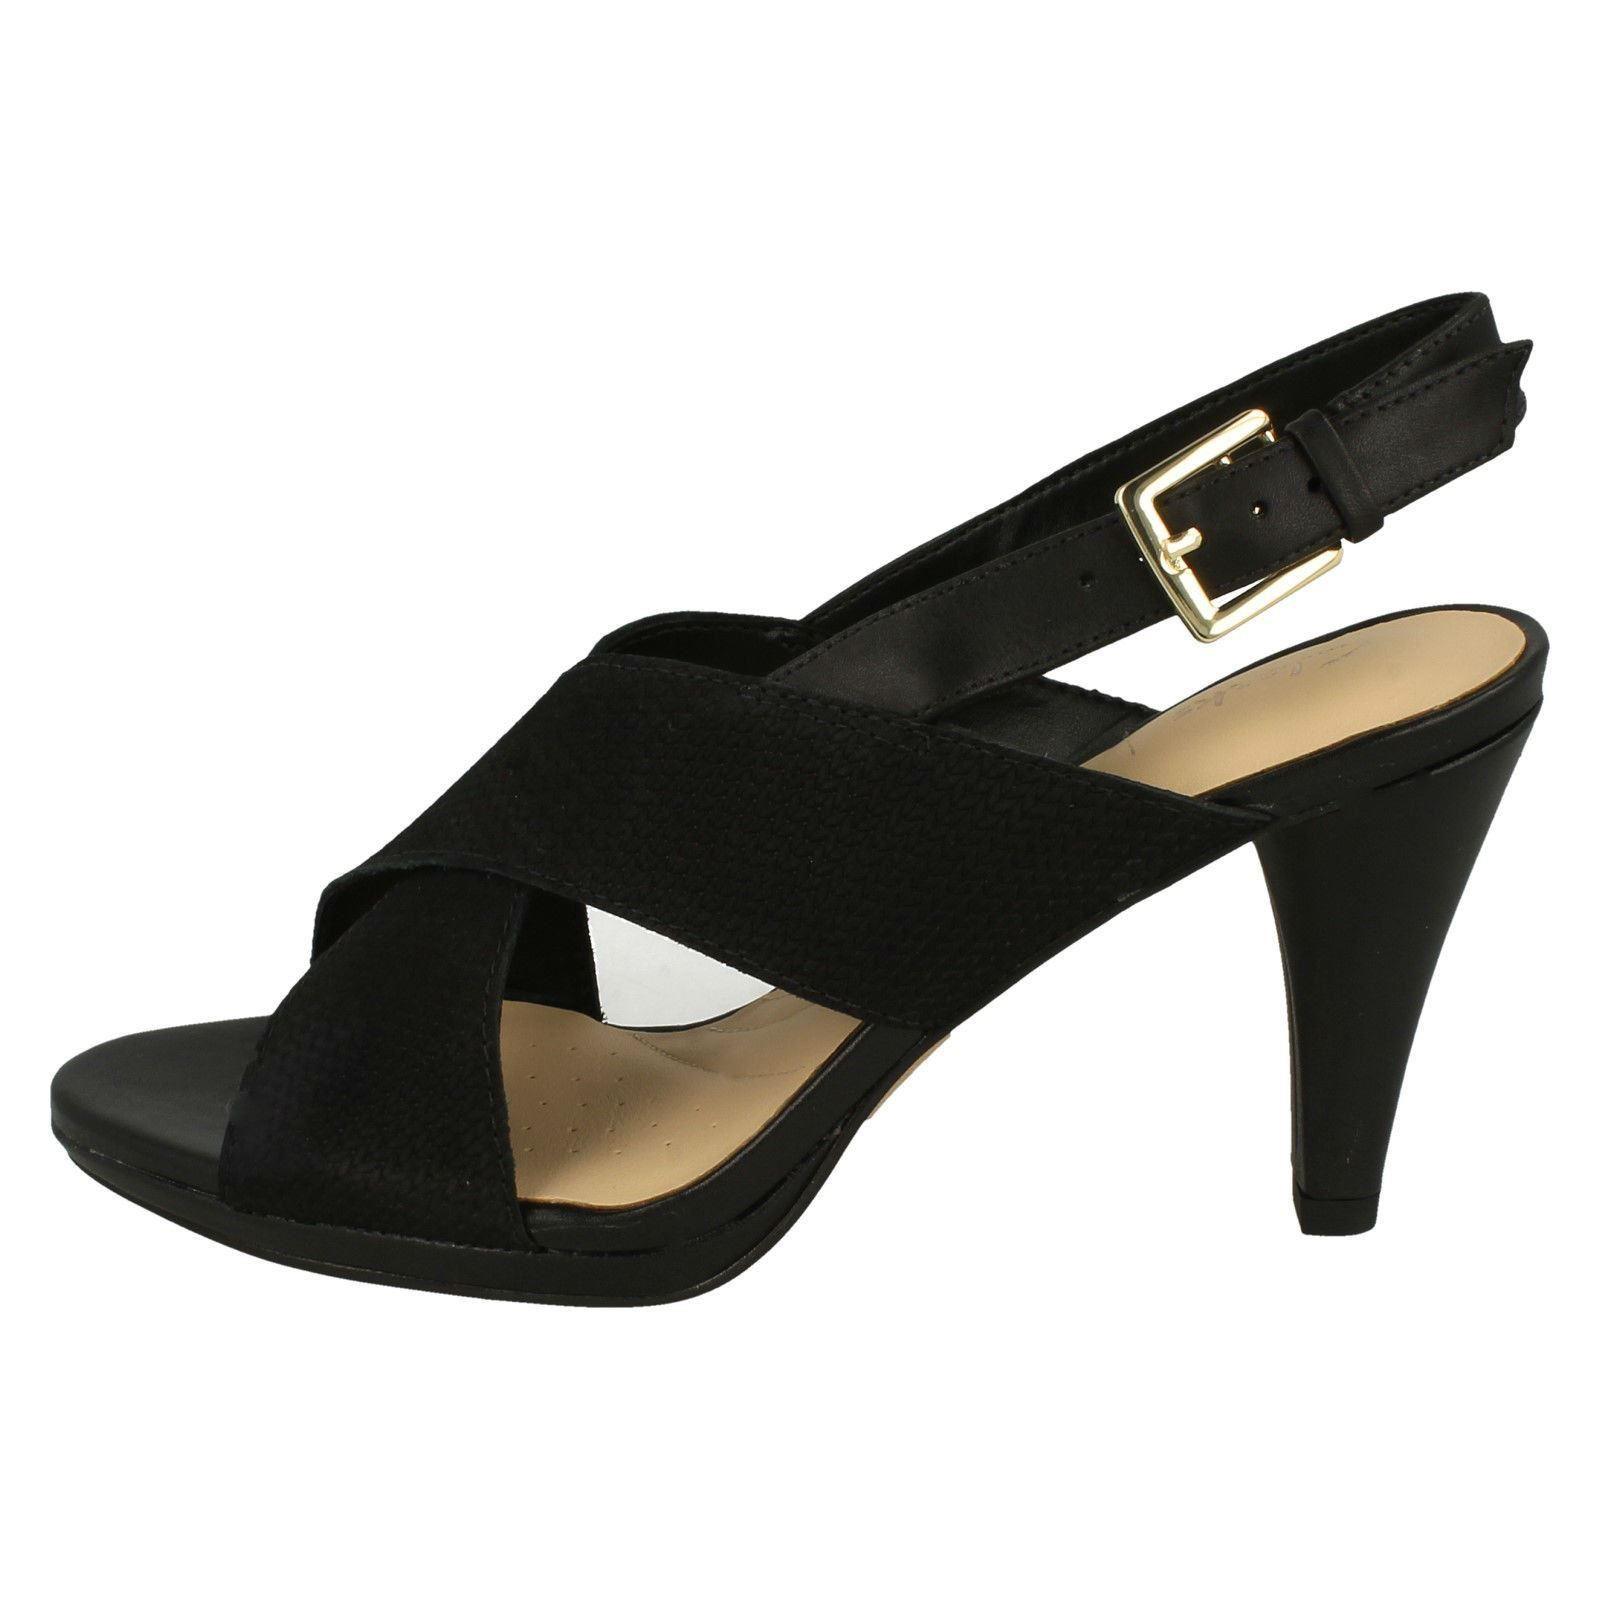 damen Clarks Heeled Slingback Sandals - - - Dalia Lotus 4aa26a